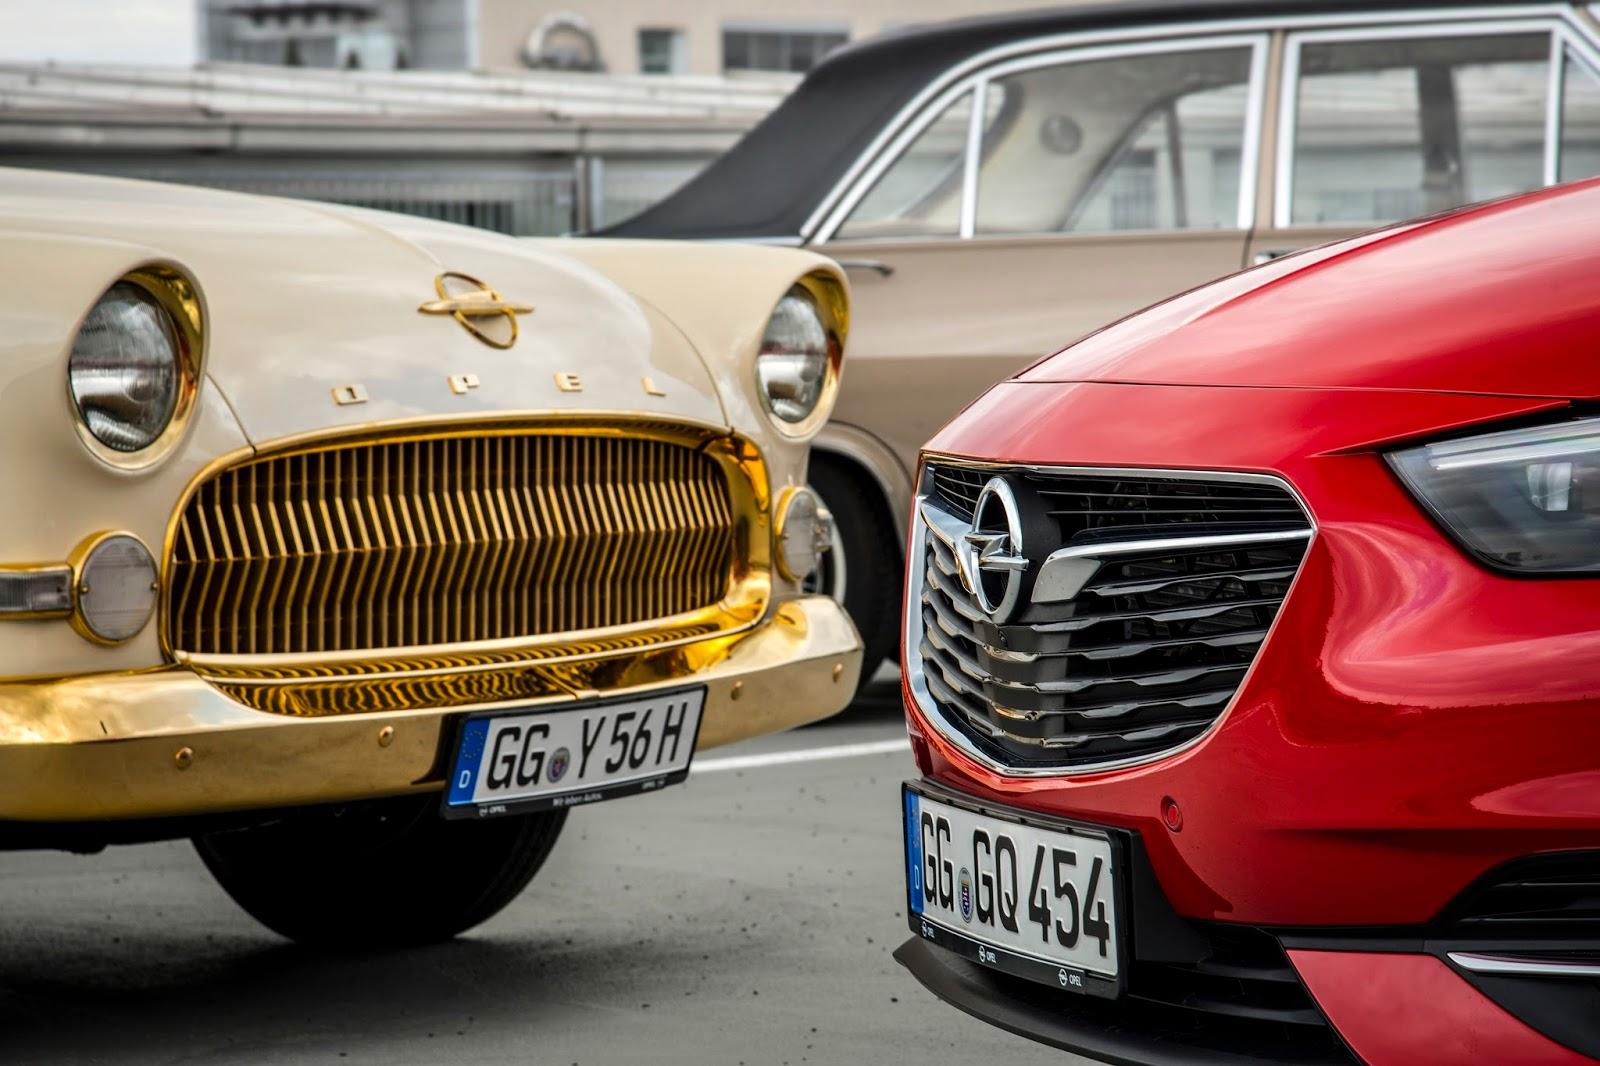 Opel Insignia Opel Kapit25C325A4n 304763 Techno Classica : Από το Opel Admiral του 1937, μέχρι το νέο Insignia